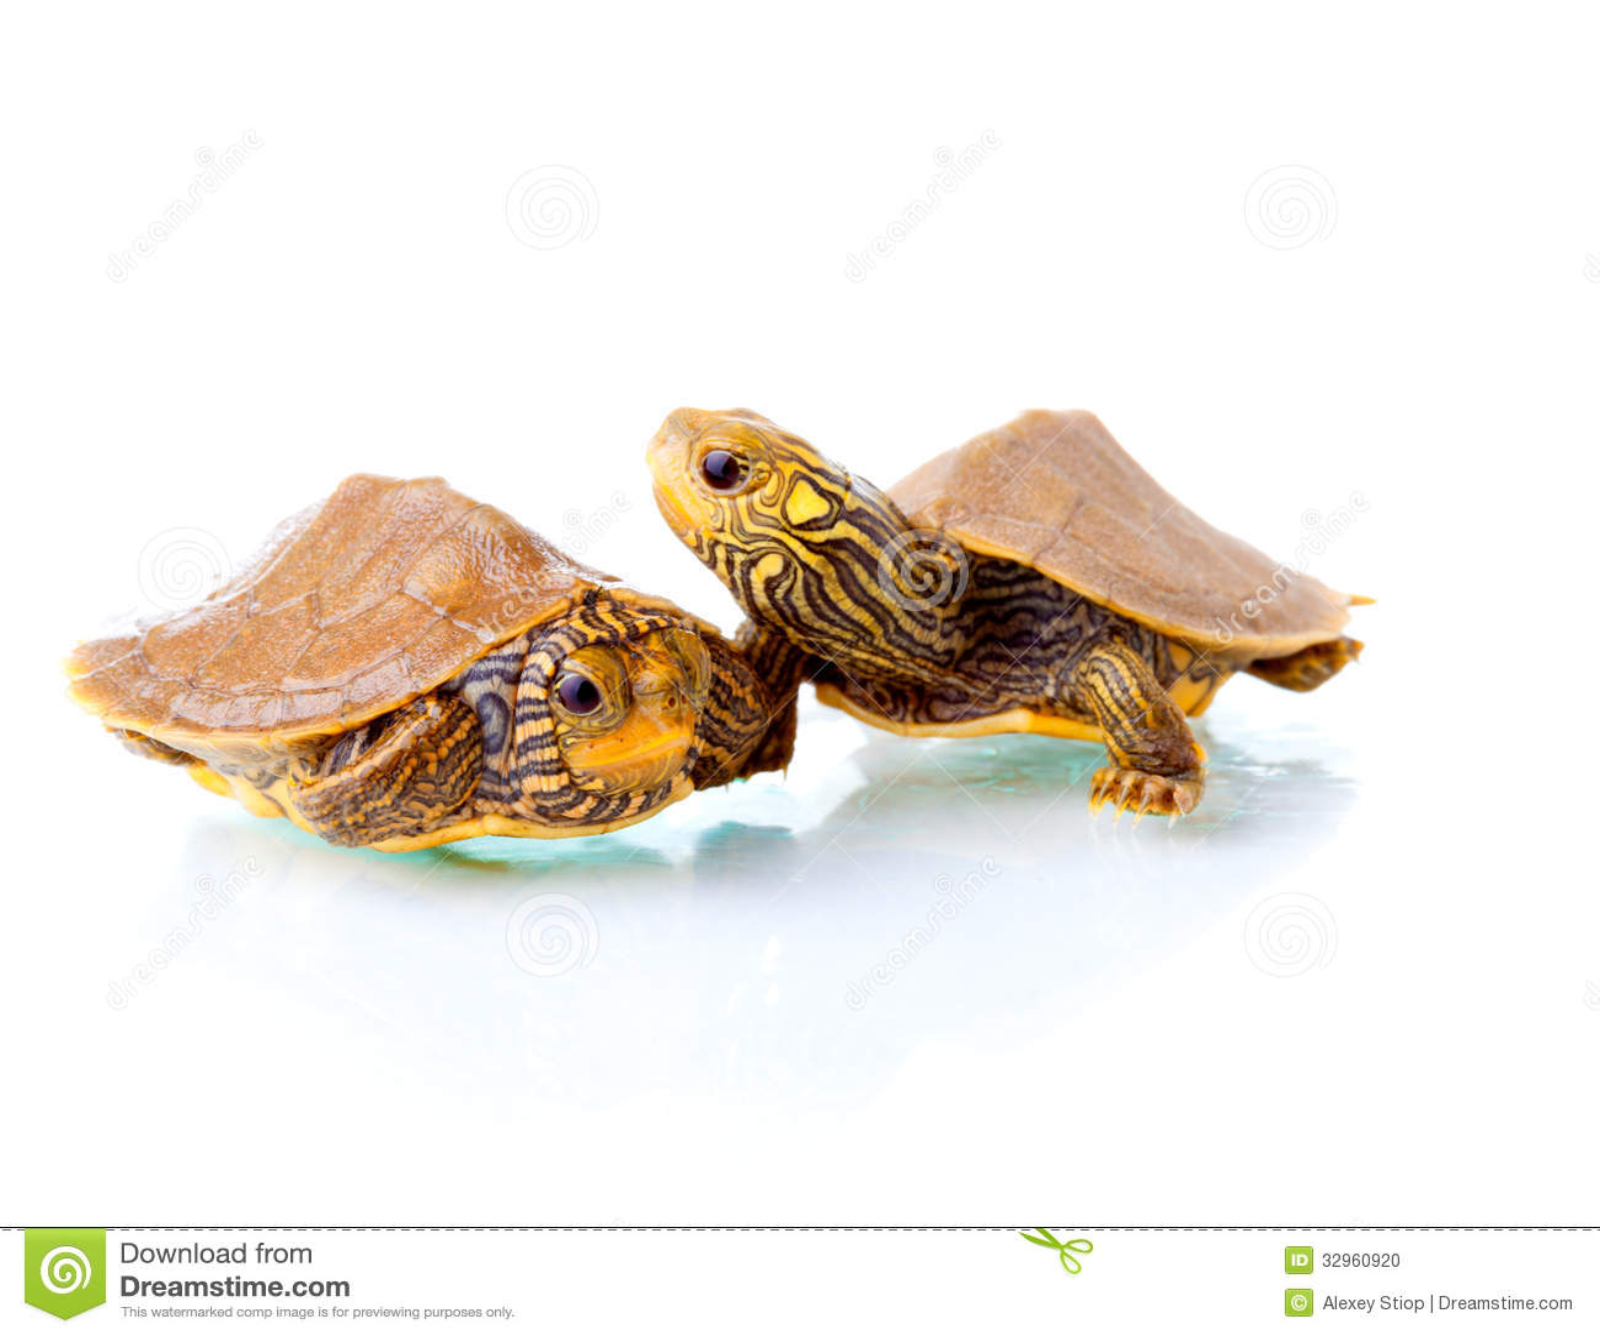 turtle white background - photo #25